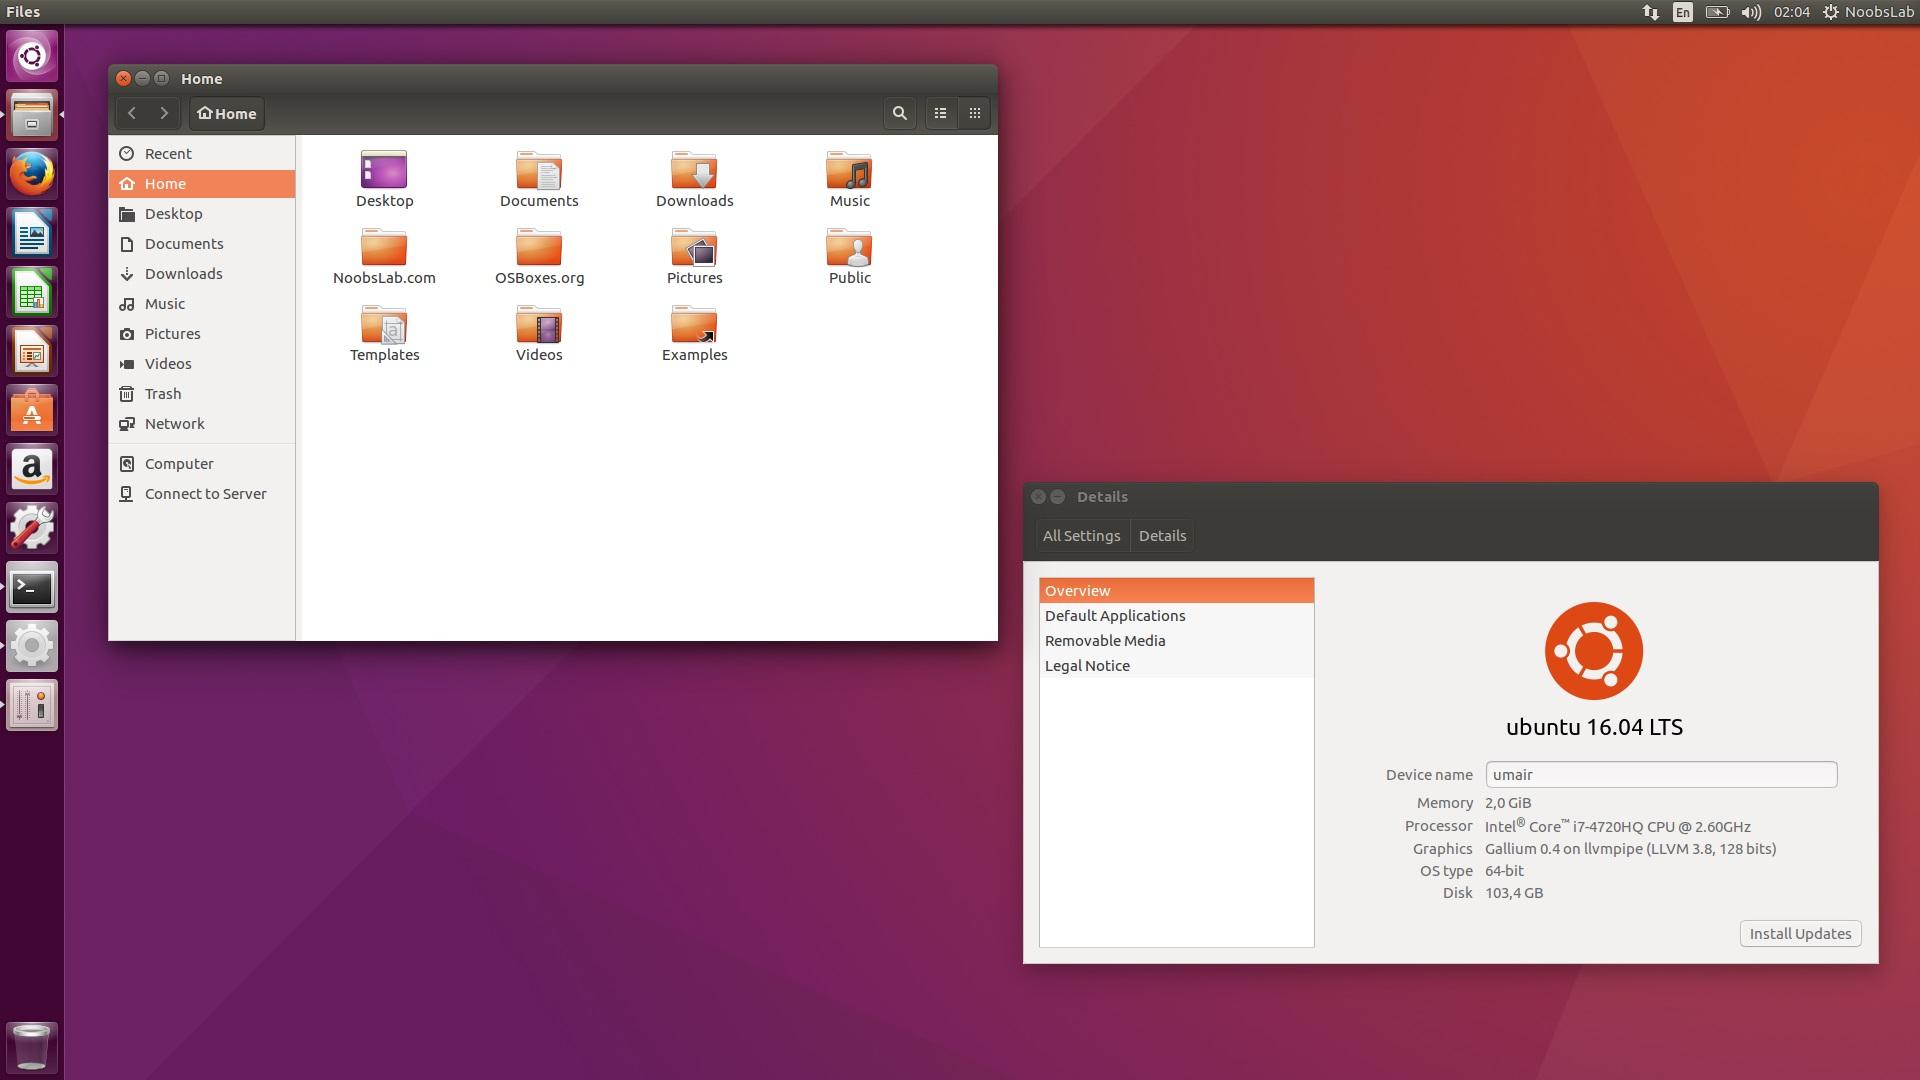 ubuntu server download iso 32 bit